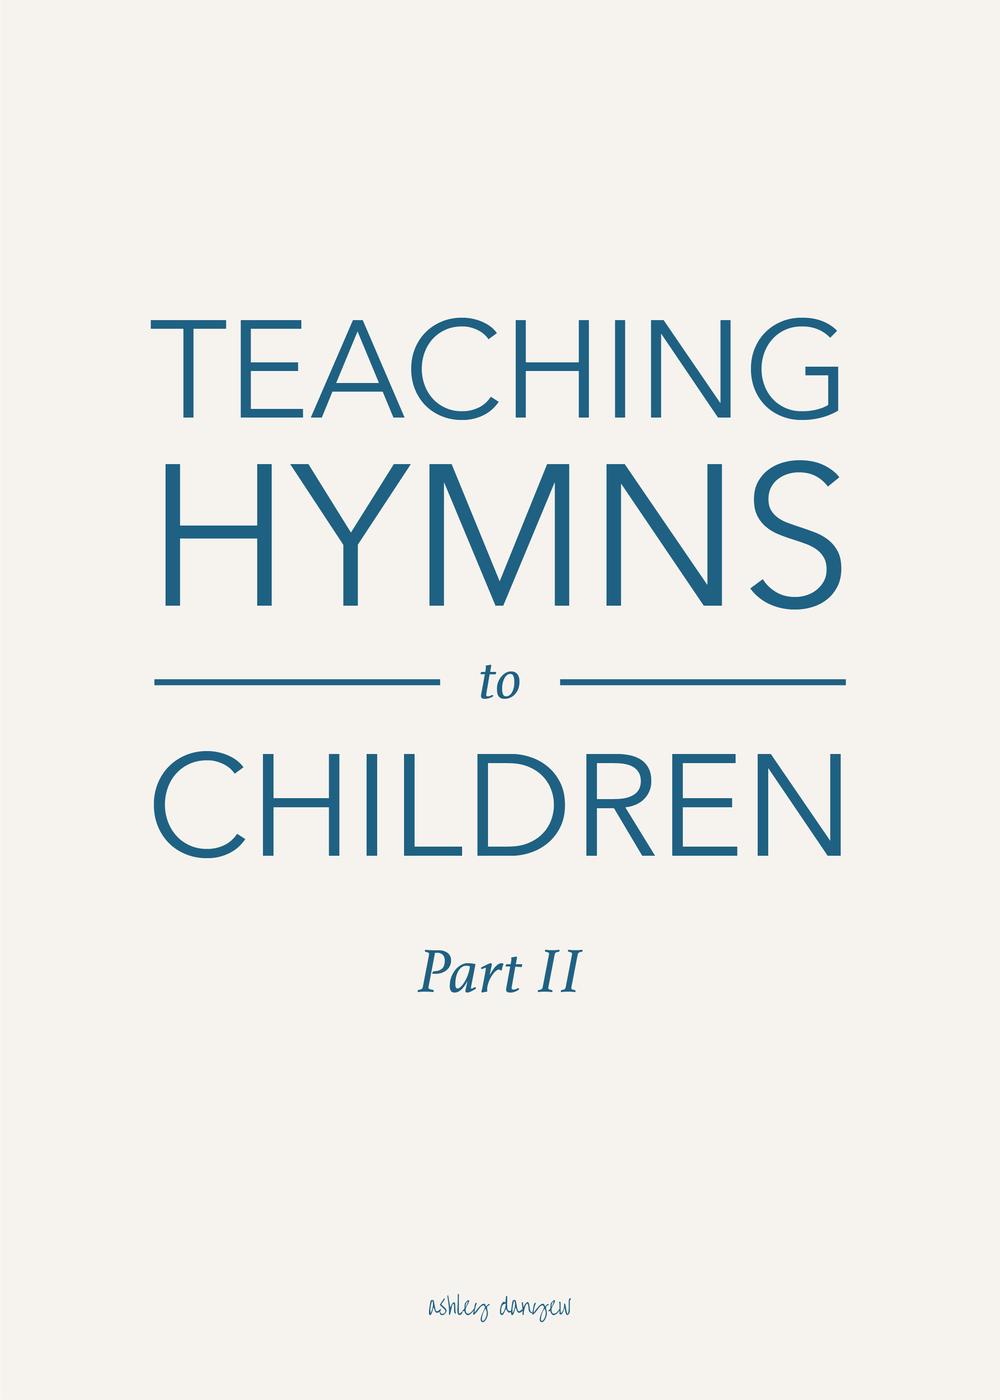 Teaching Hymns to Children_II.png